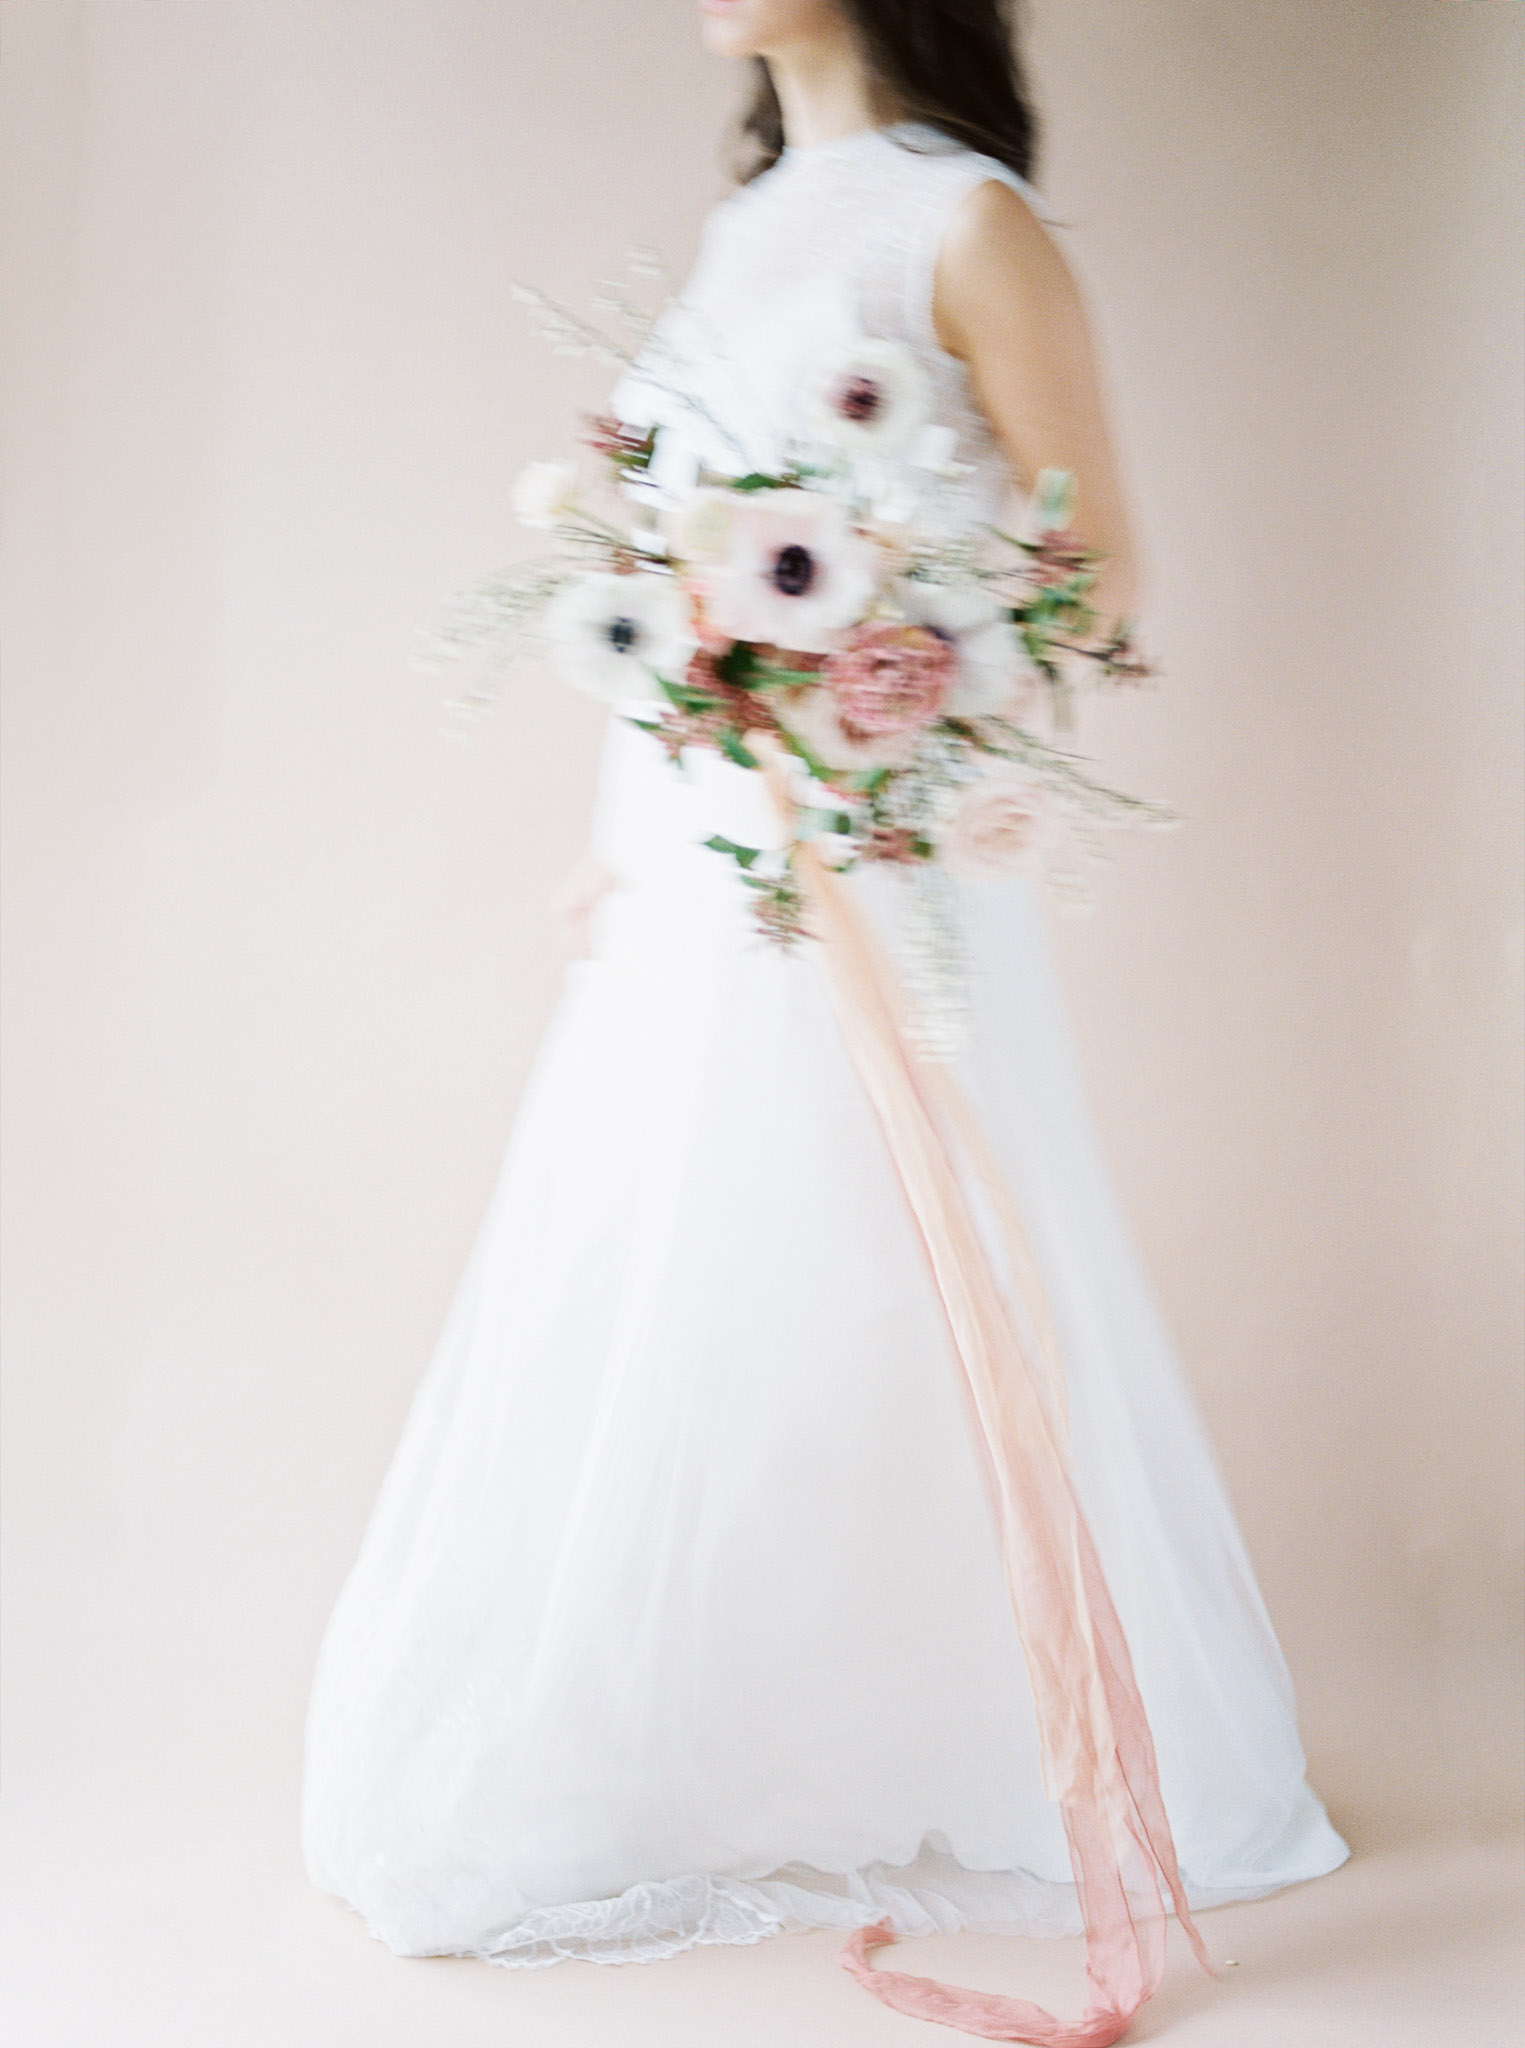 ModernNaturalStyledShoot_MaricleKang_Vancouver Wedding Photographer__04.jpg